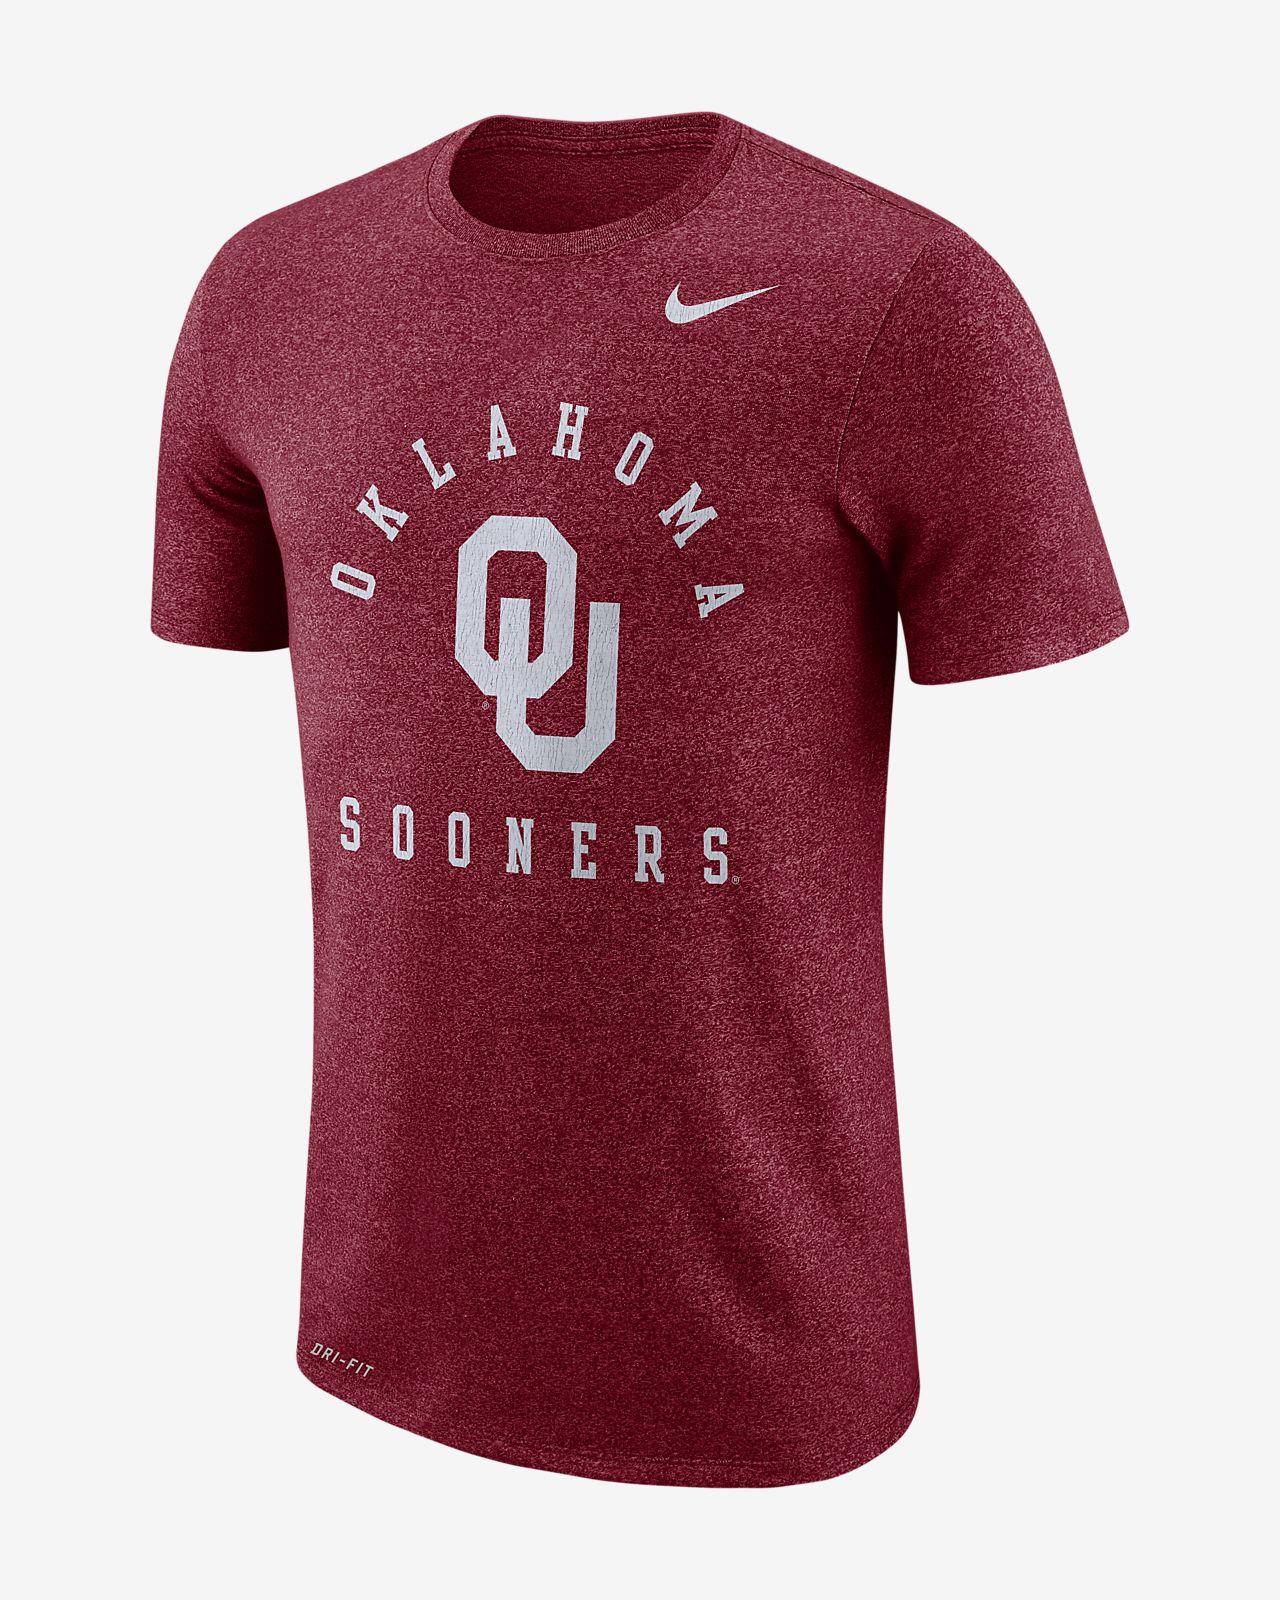 Nike College Marled (Oklahoma) Men's T-Shirt